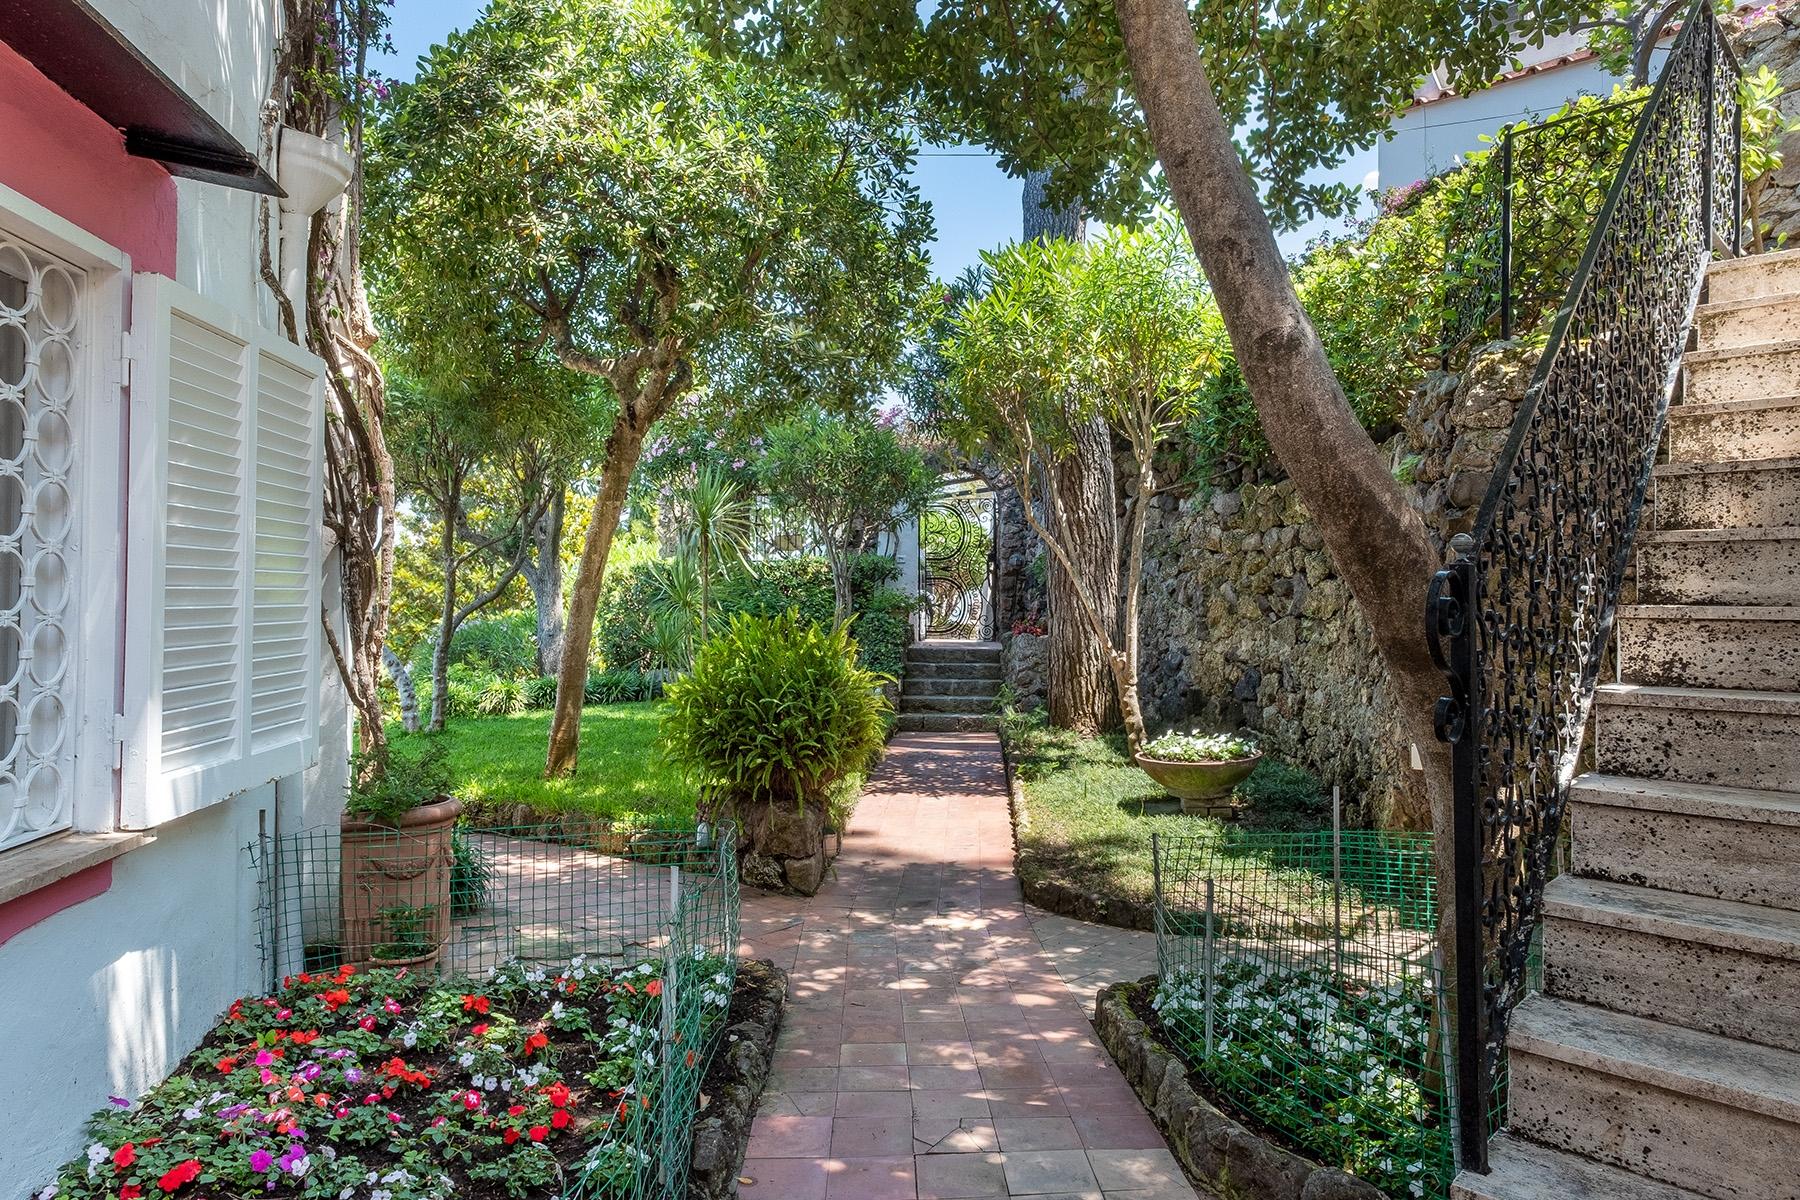 Villa in Vendita a Ischia: 5 locali, 206 mq - Foto 22